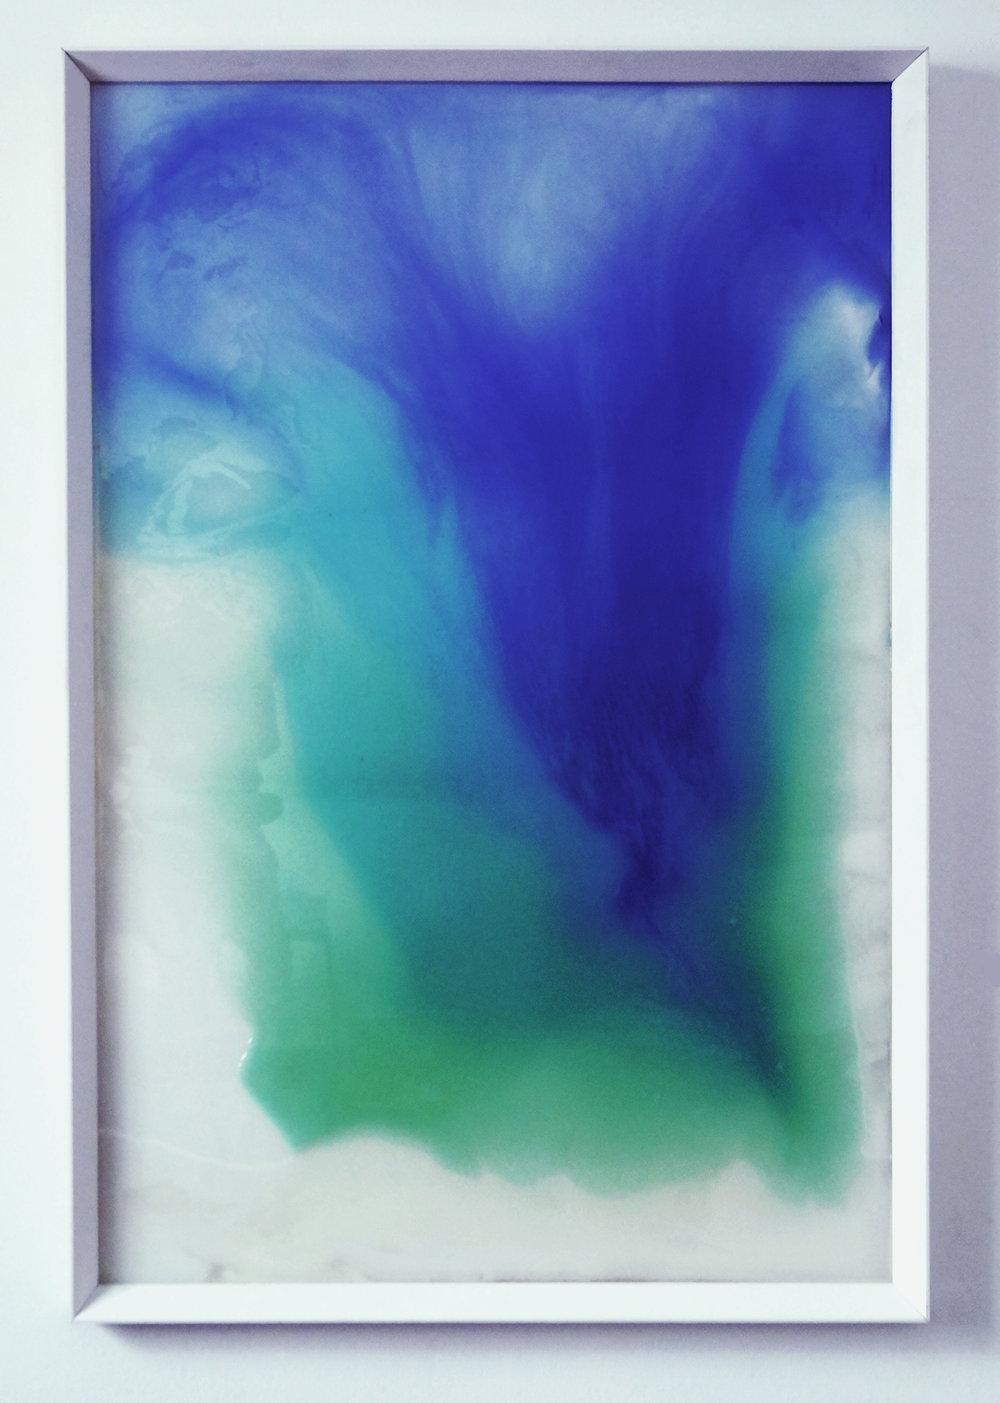 Contenibles III    Epoxy resin, liquid methacrylate and pigment